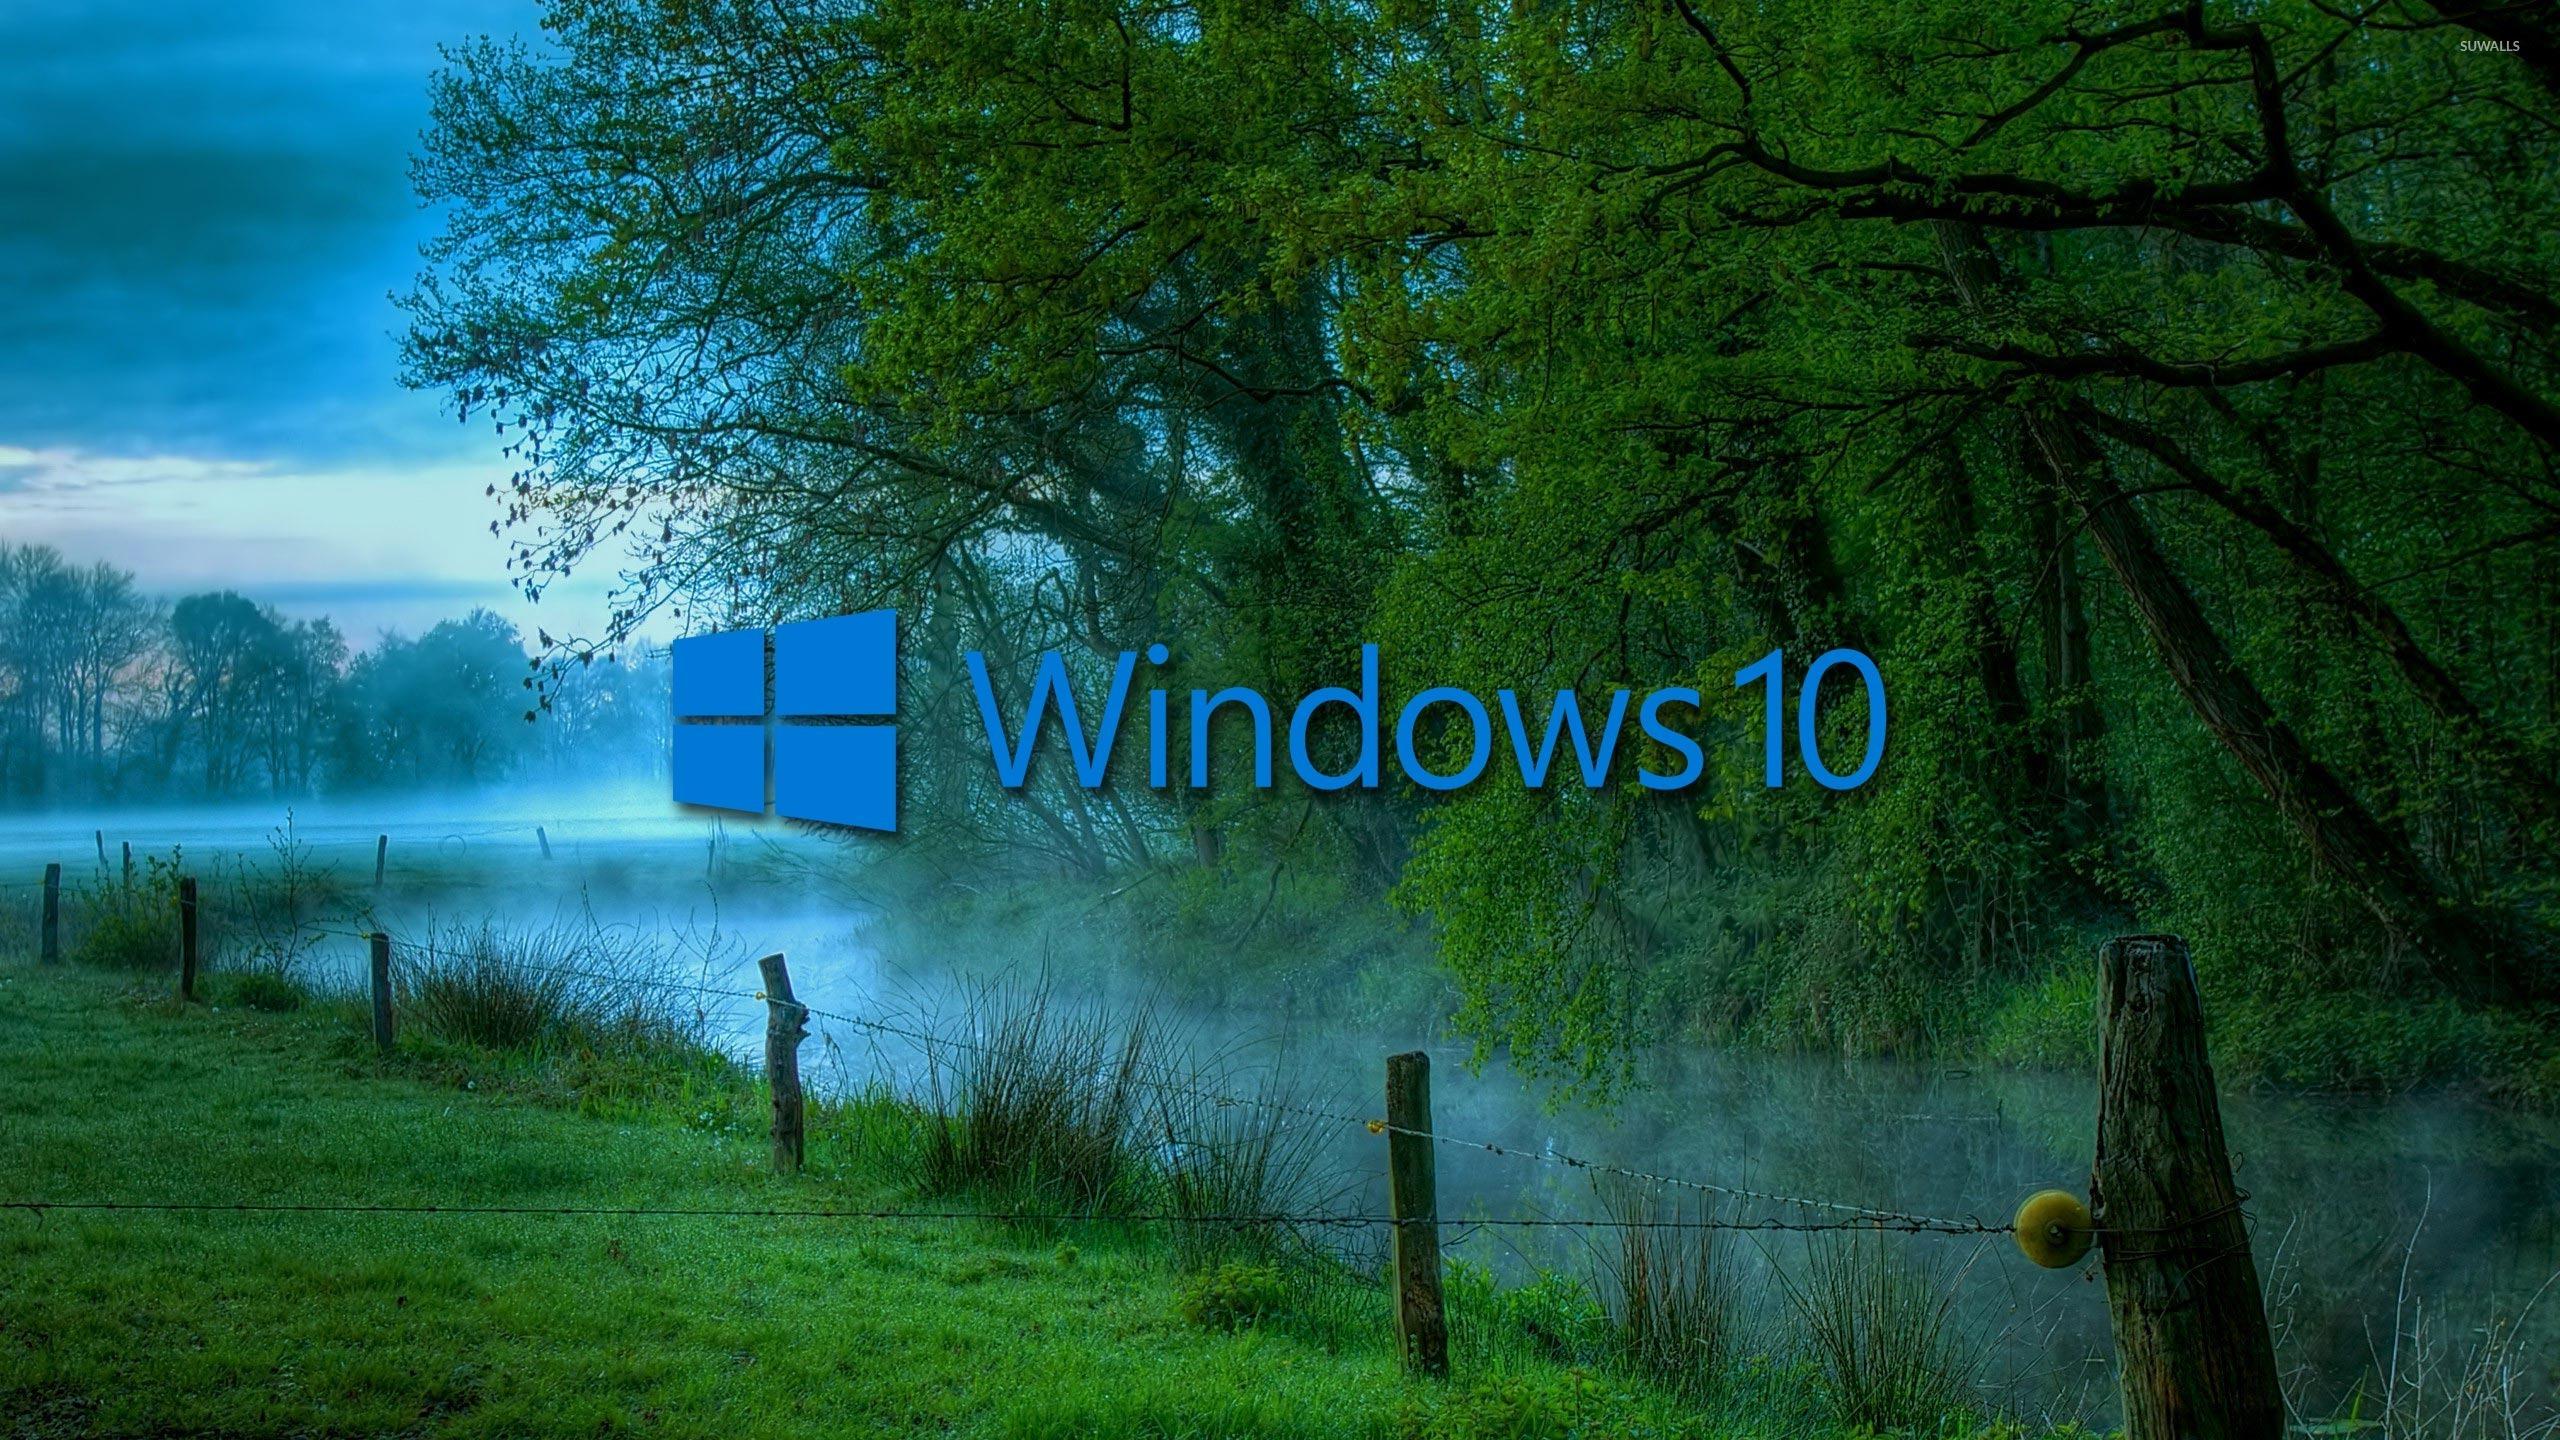 49 ] Windows 10 Fog Wallpaper On WallpaperSafari